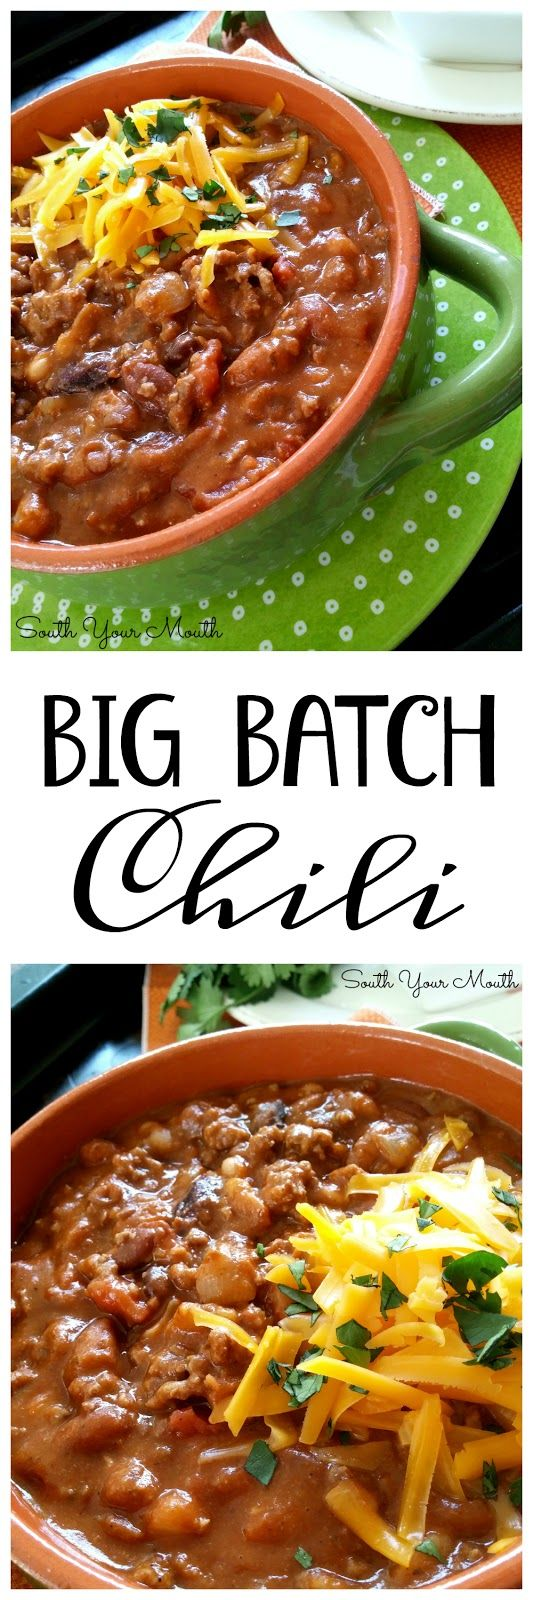 Big Batch Beef Bean Chili Chilli Recipes Cooking Recipes Beef Bean Chili Recipe